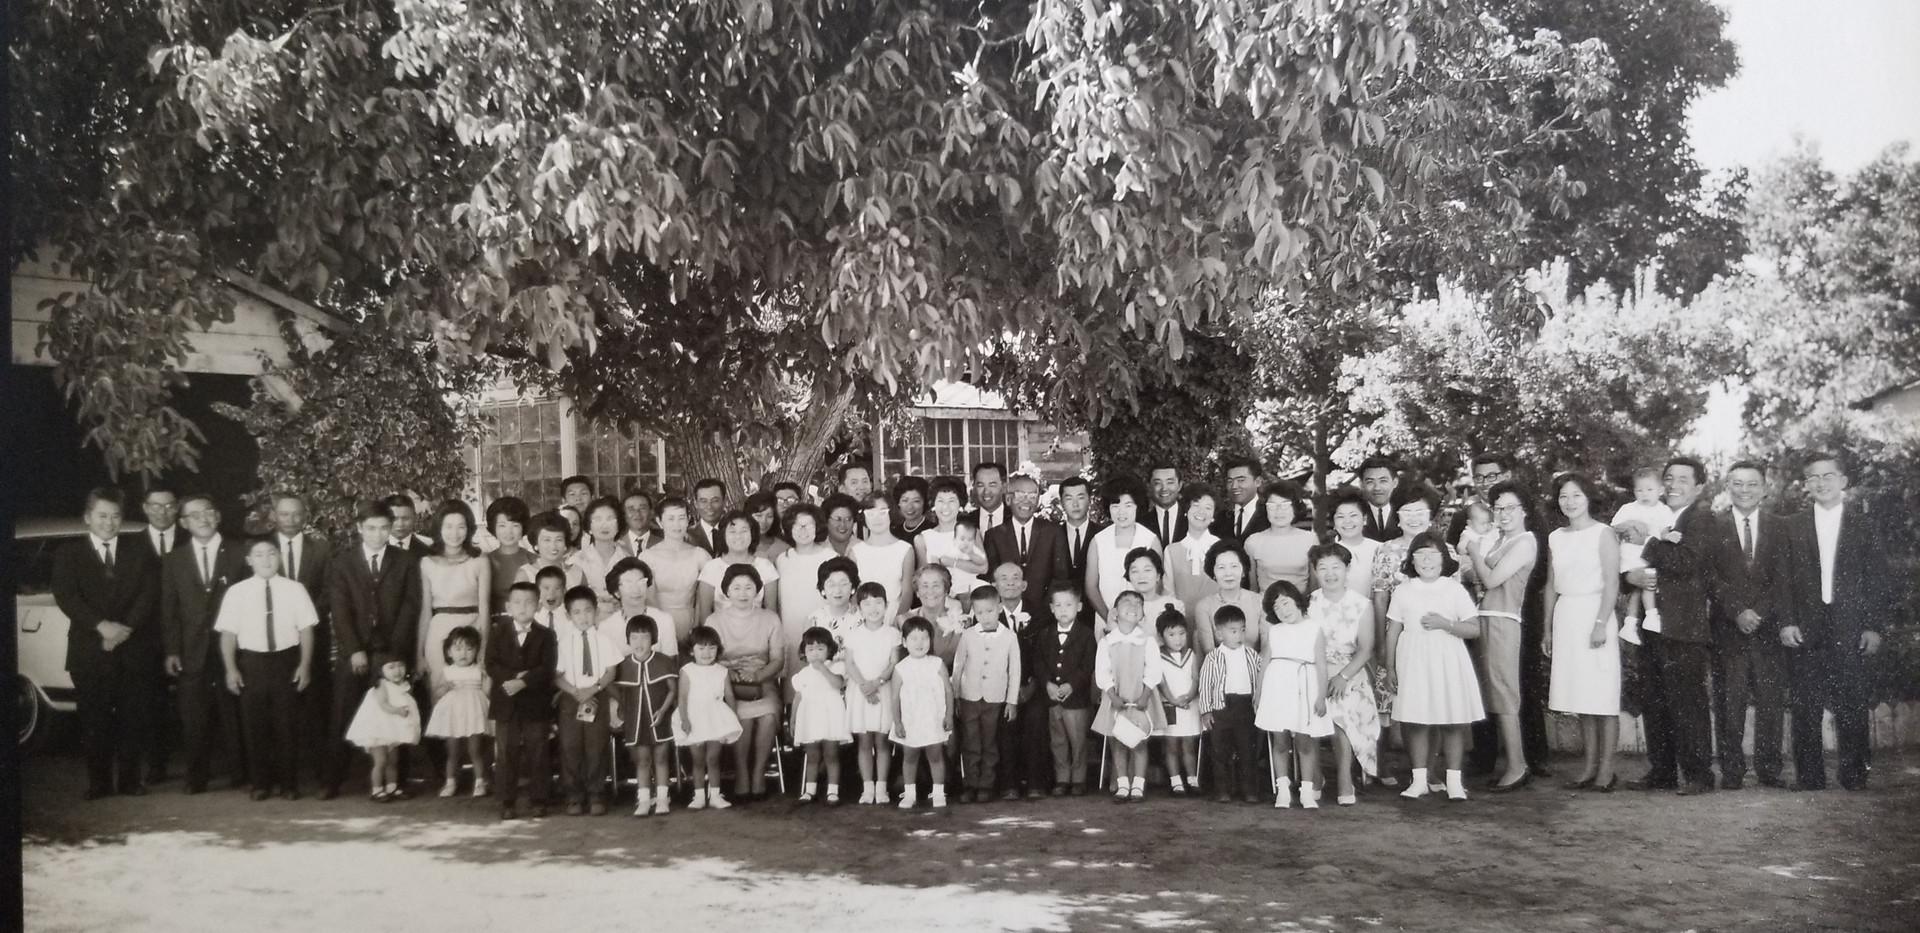 Itaya Family (ca. 1963), includes 4 generations of the Itaya family